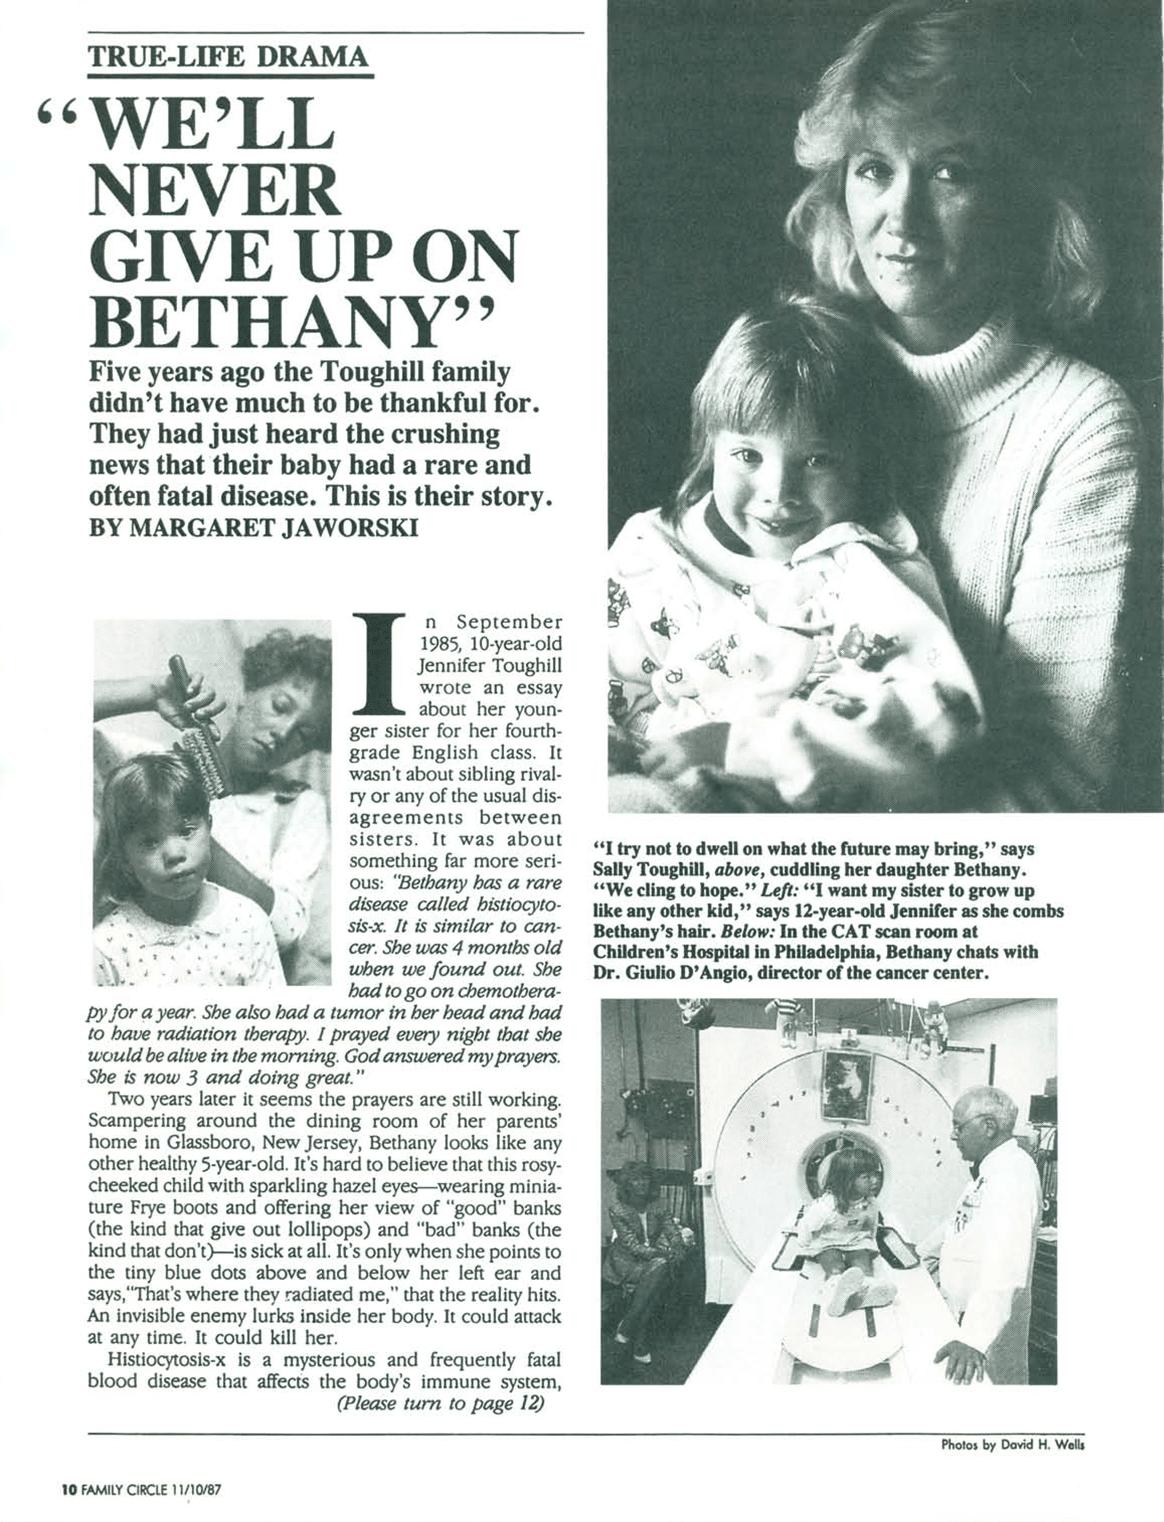 family circle article